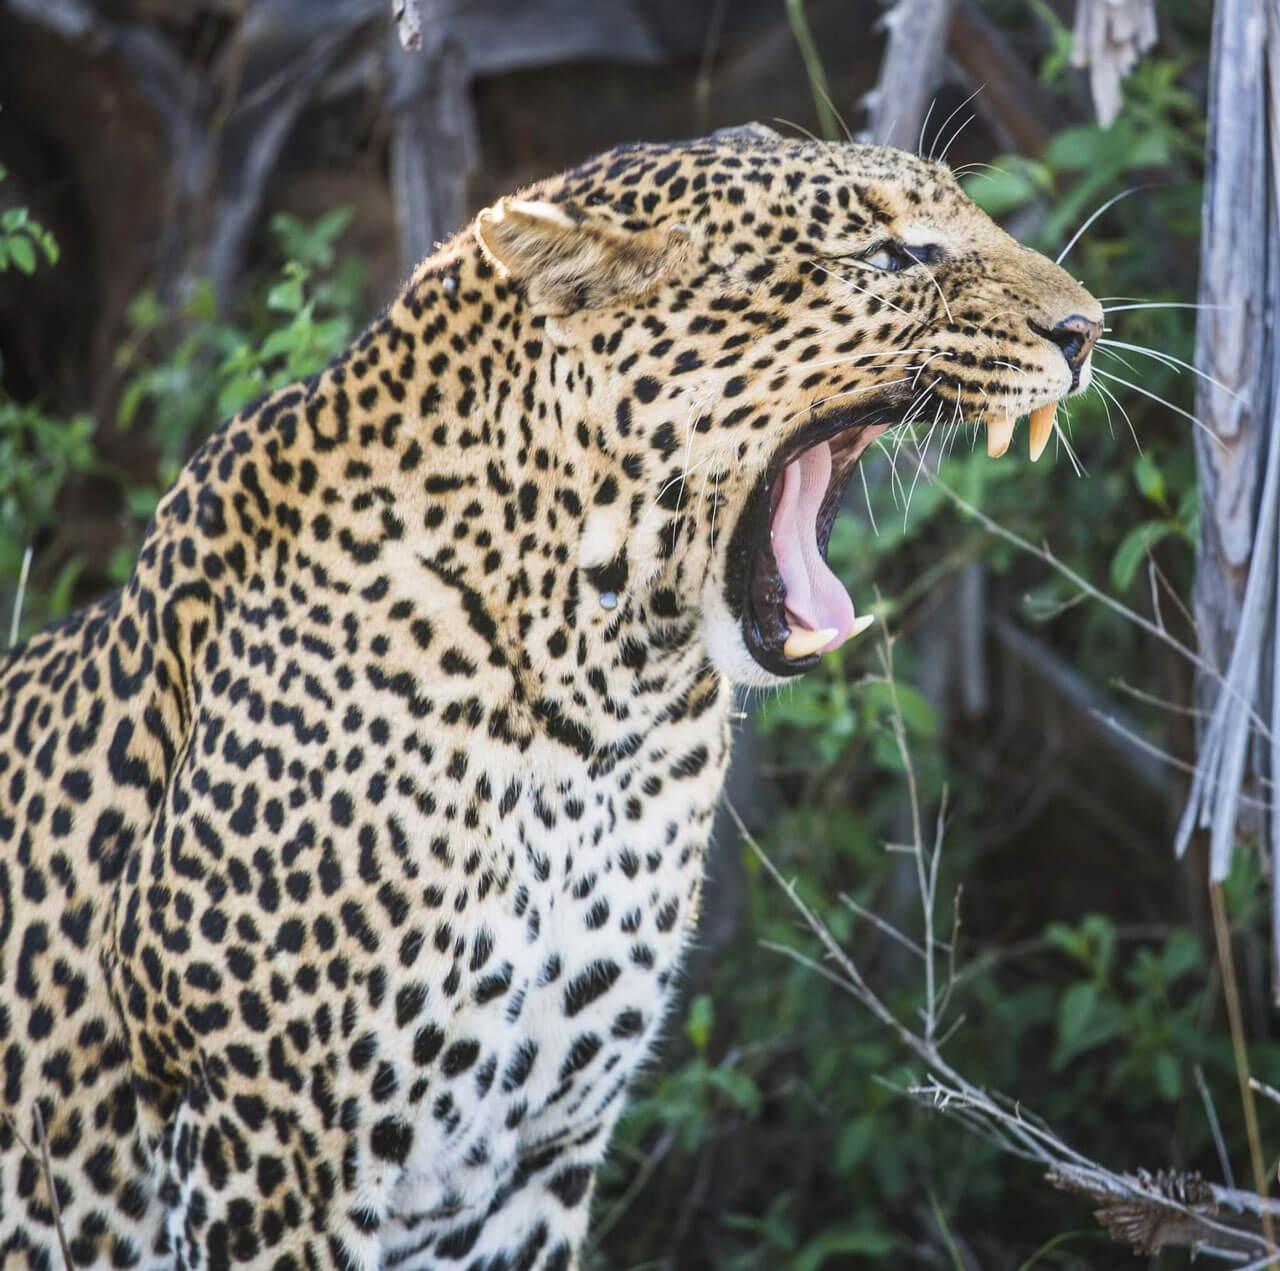 Leopard at Tsavo West National Park, Kenya